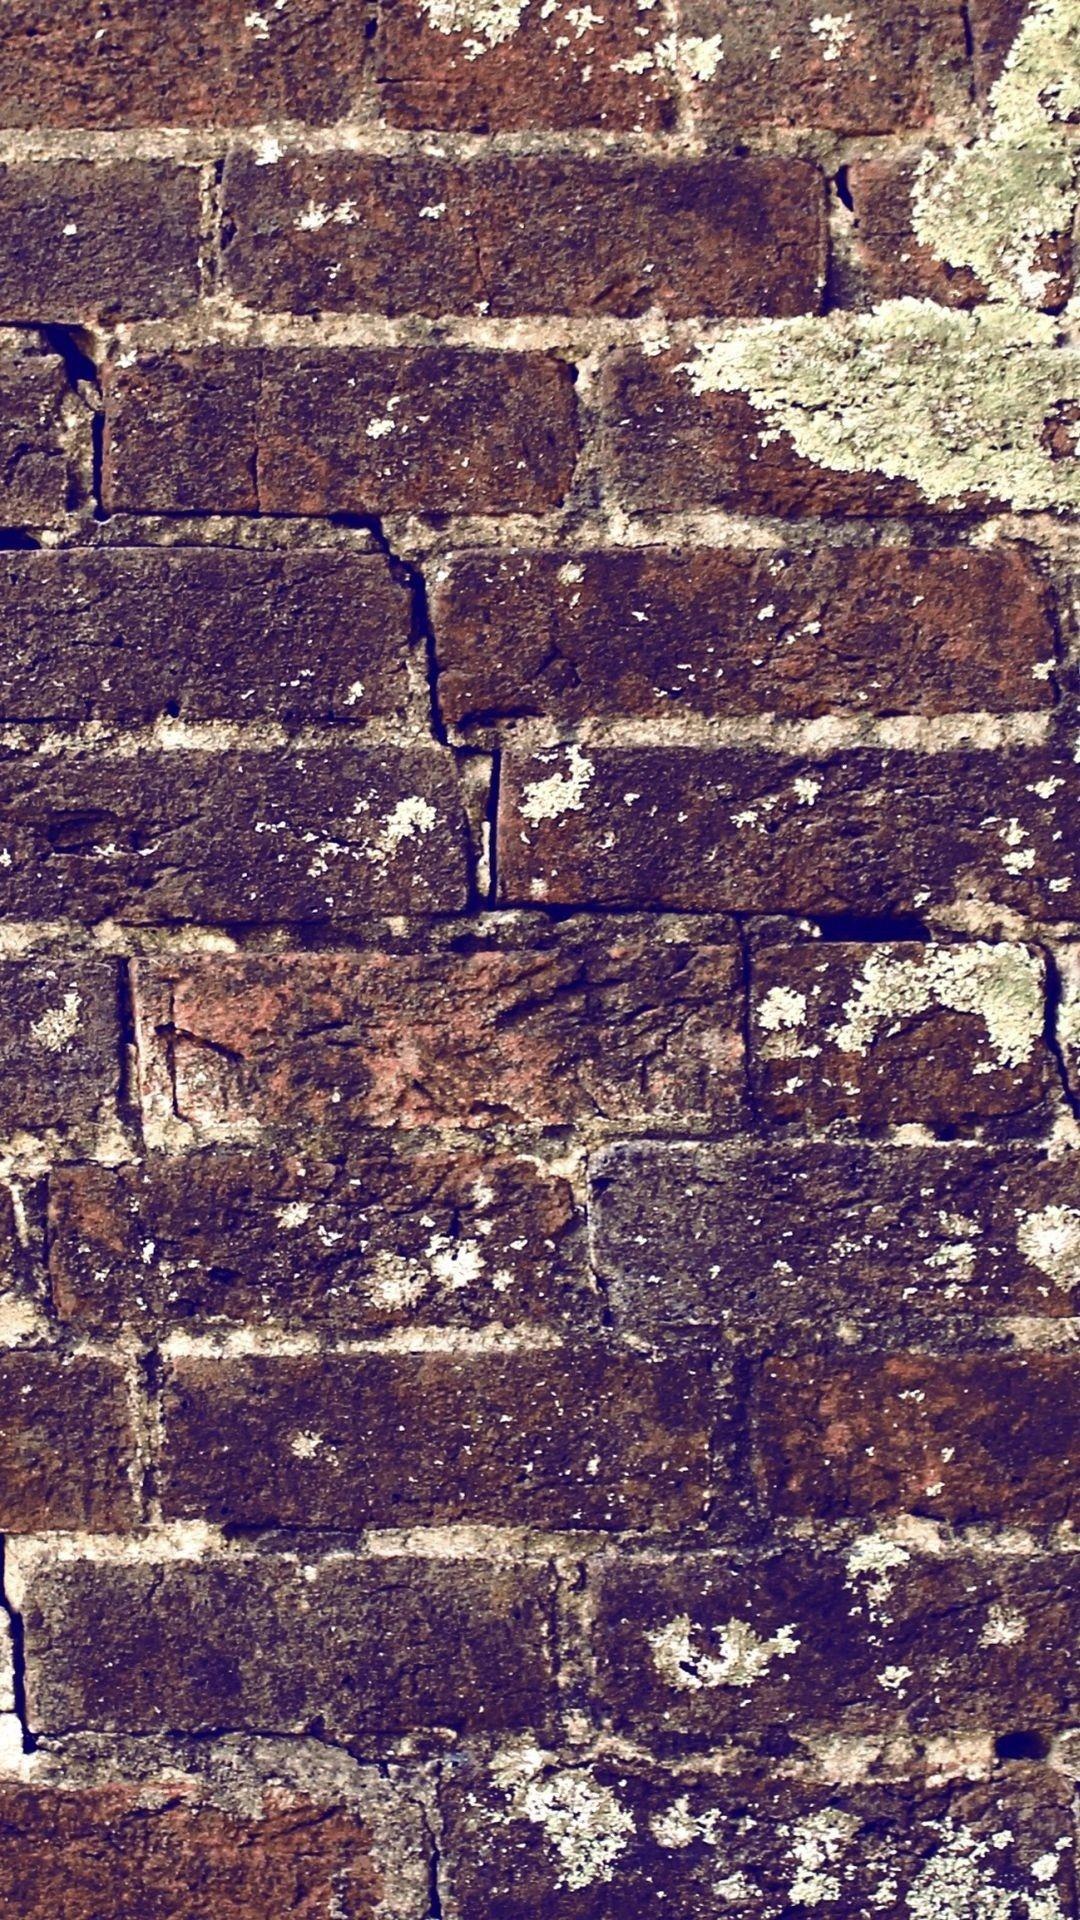 Brick Wall Texture iOS 11 iPhone X Wallpaper HD Check more